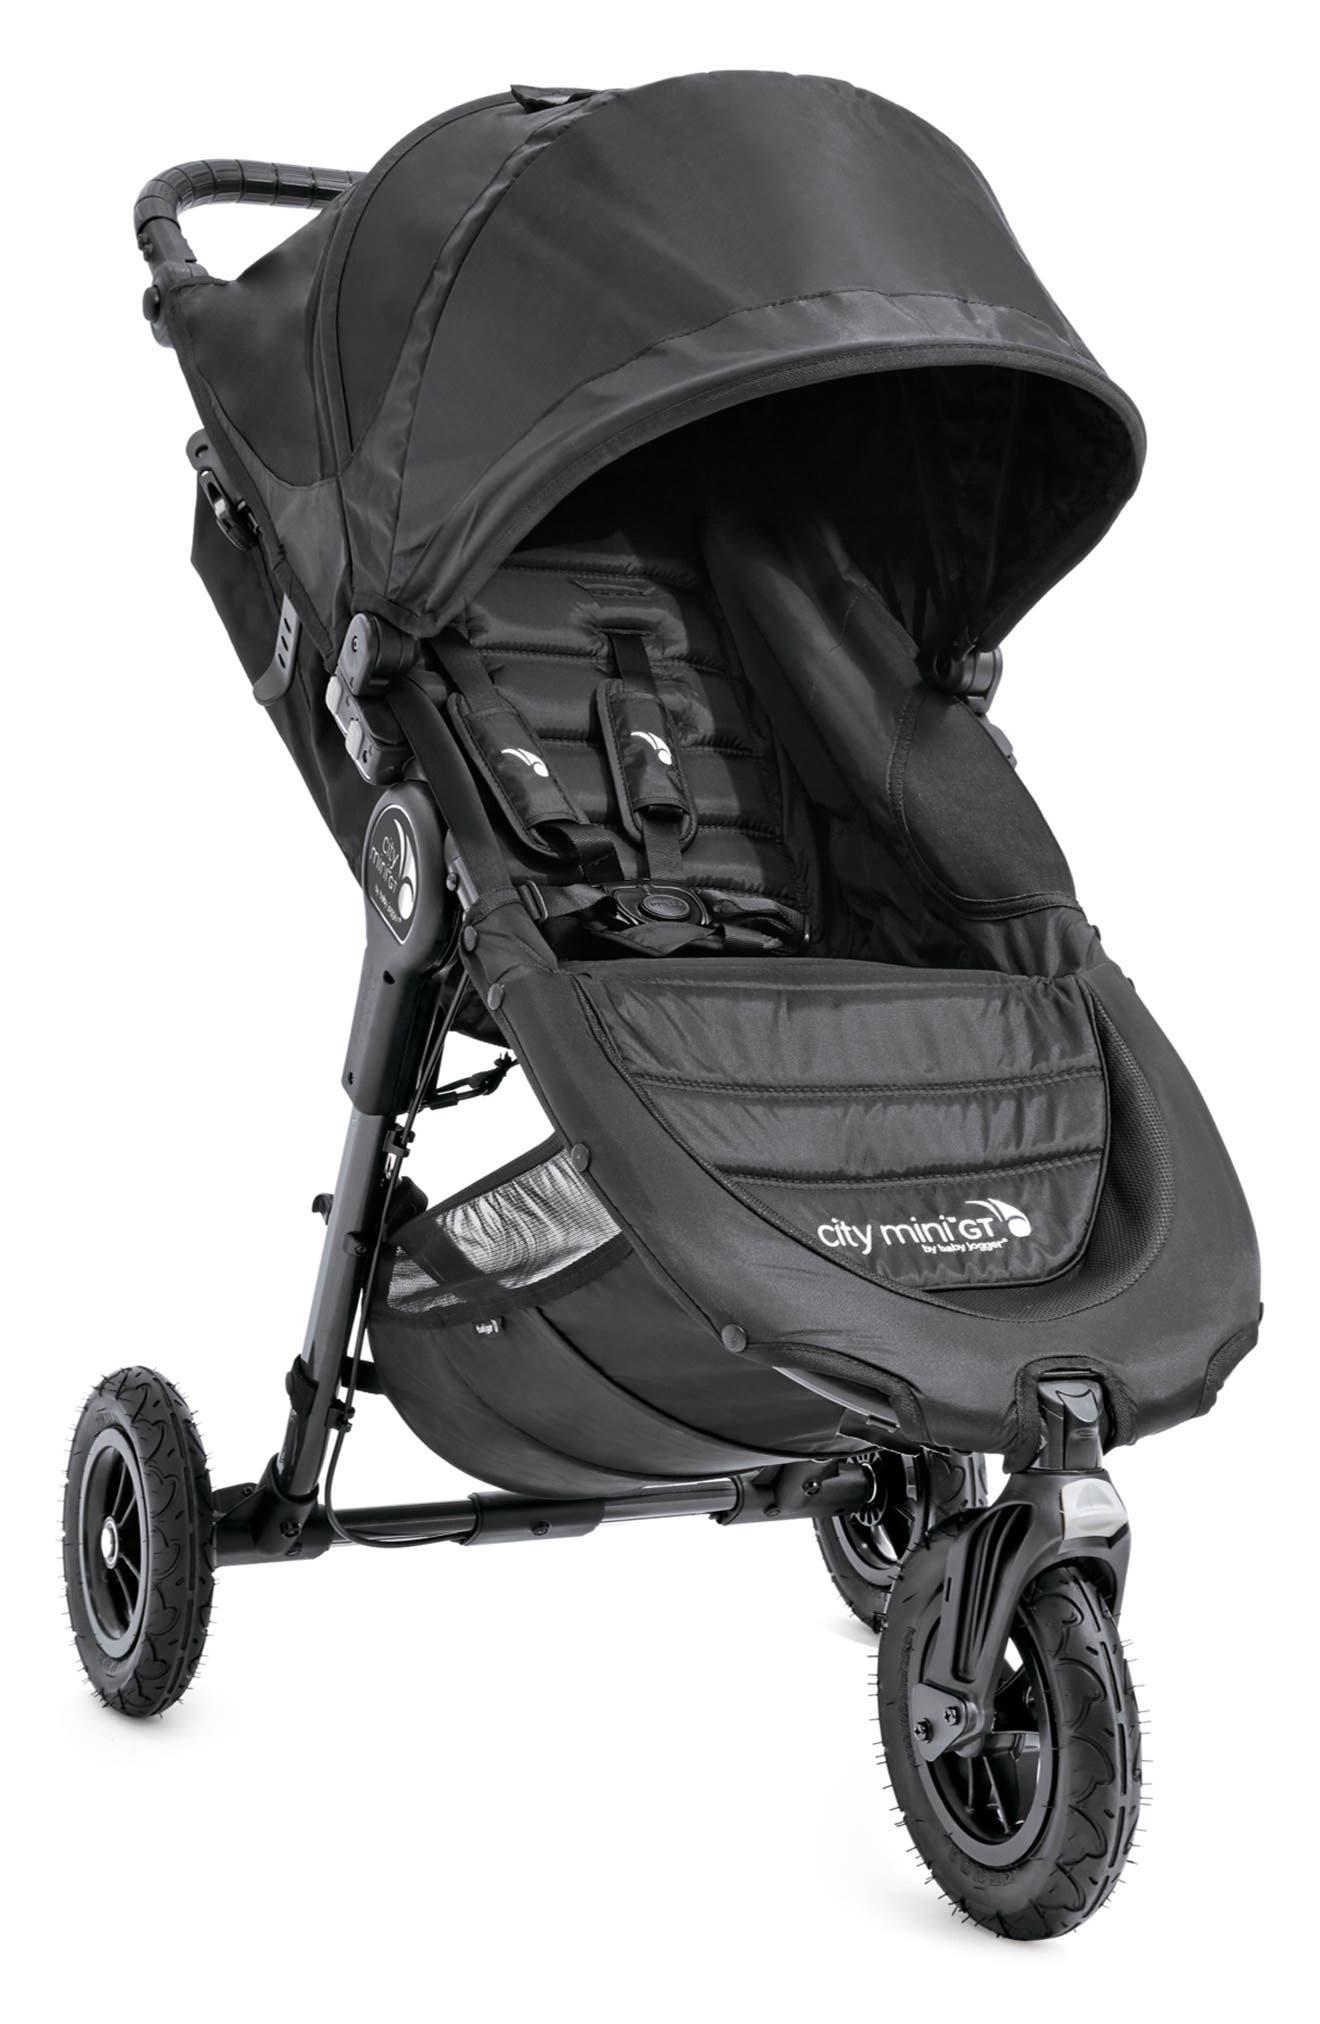 Main Image - Baby Jogger City Mini GT® Single Stroller & Parent Console Attachment